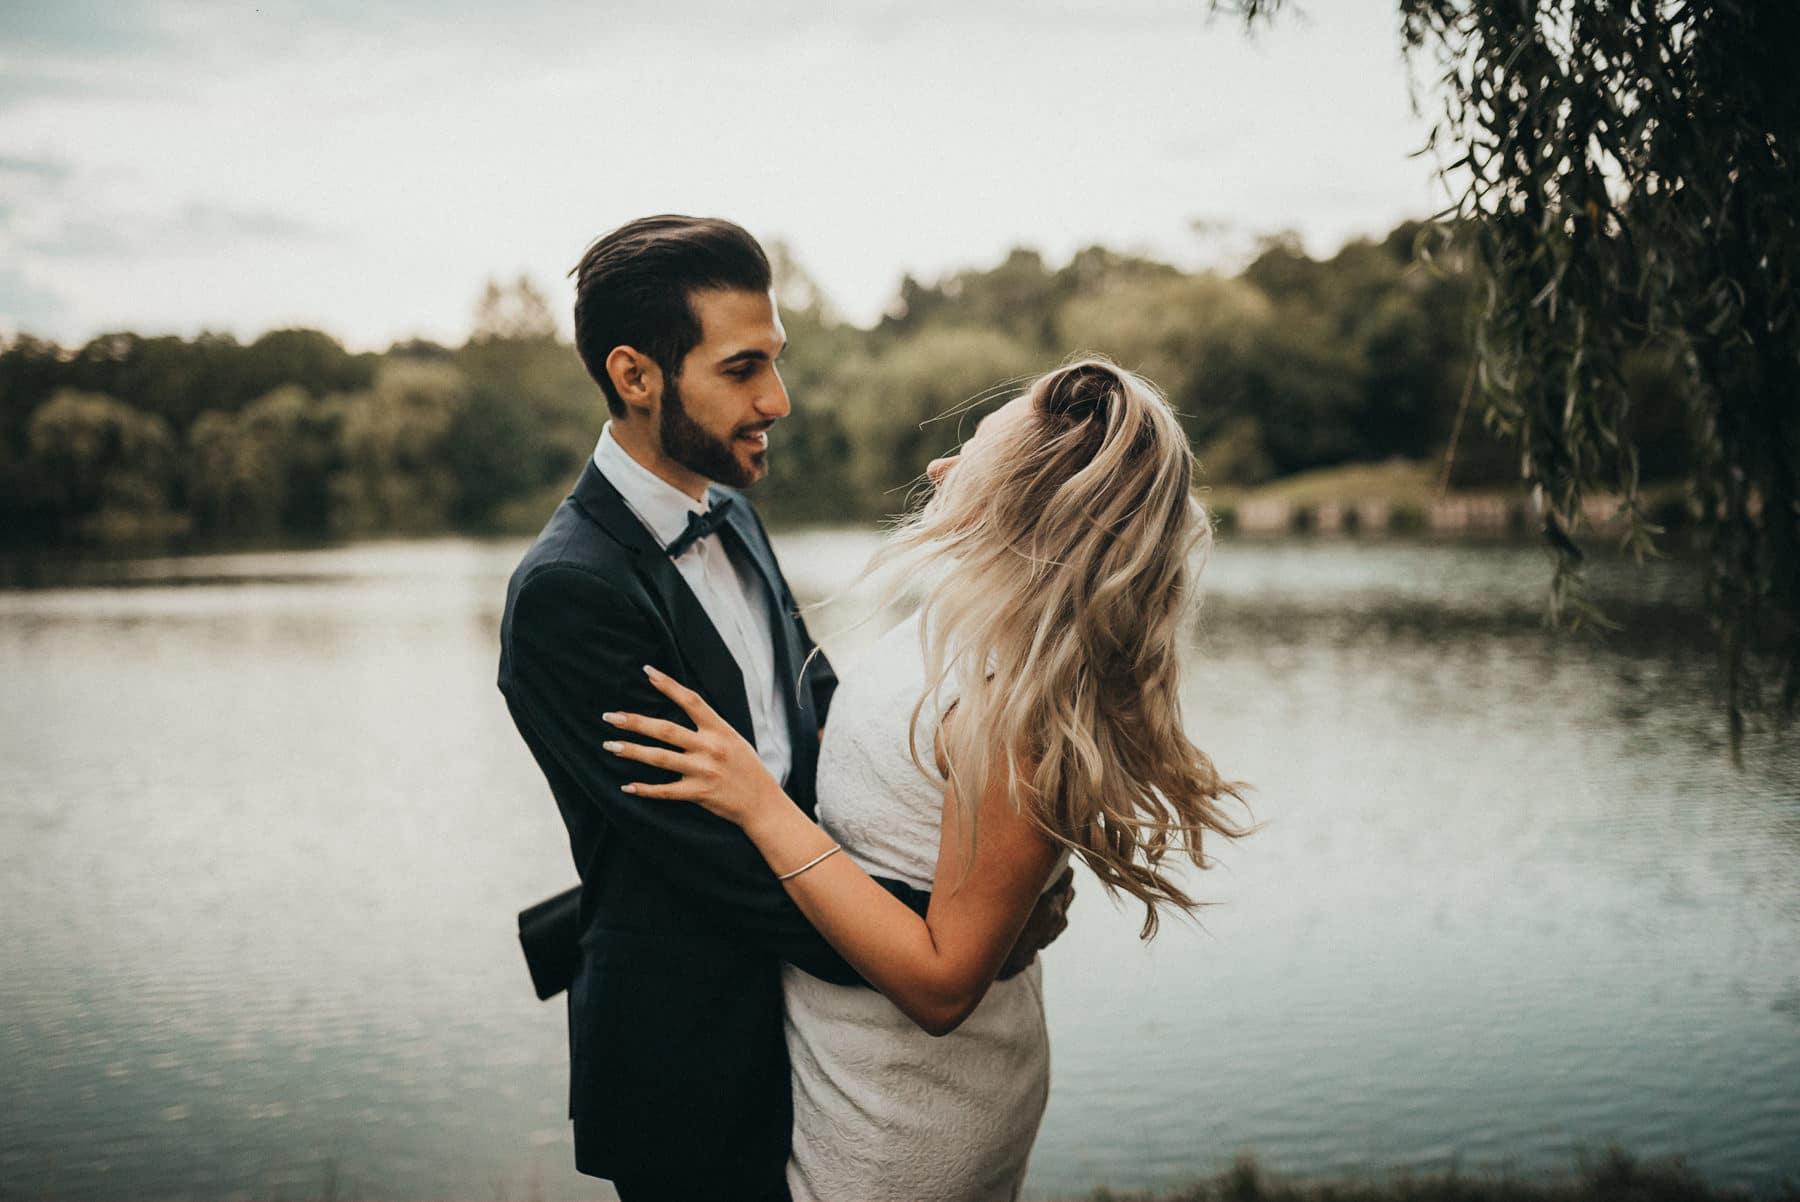 Wedding photographer Kurpark Oberlaa